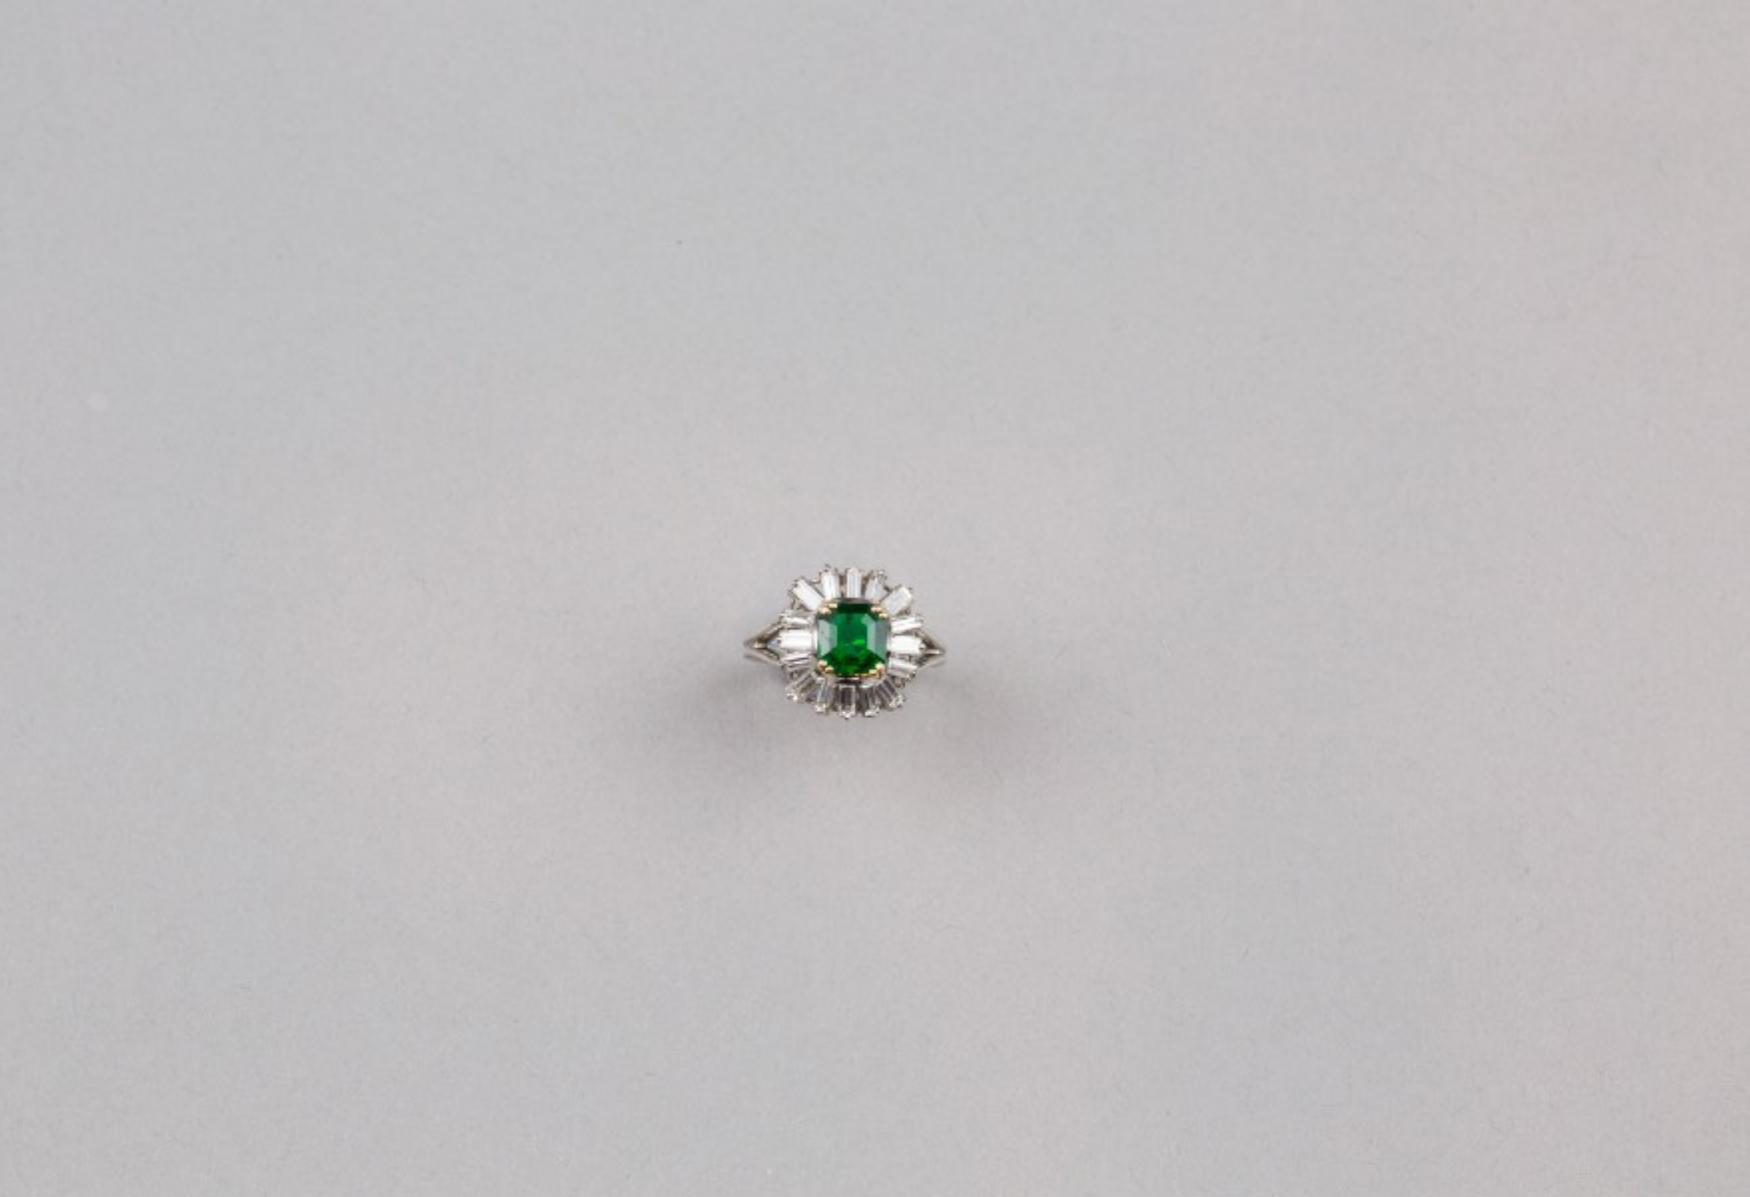 Lot 59 - An Emerald Diamond Ring